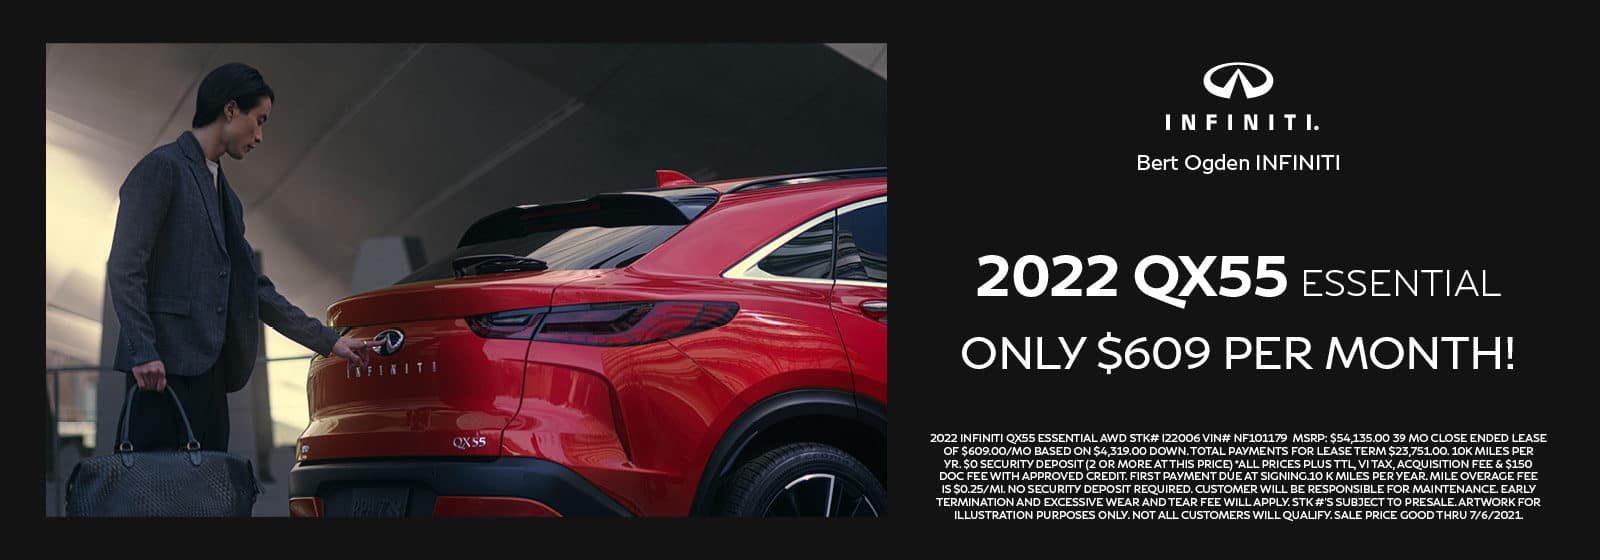 2022 INFINITI QX55 ESSENTIAL   Bert Ogden INFINITI   Edinburg, TX